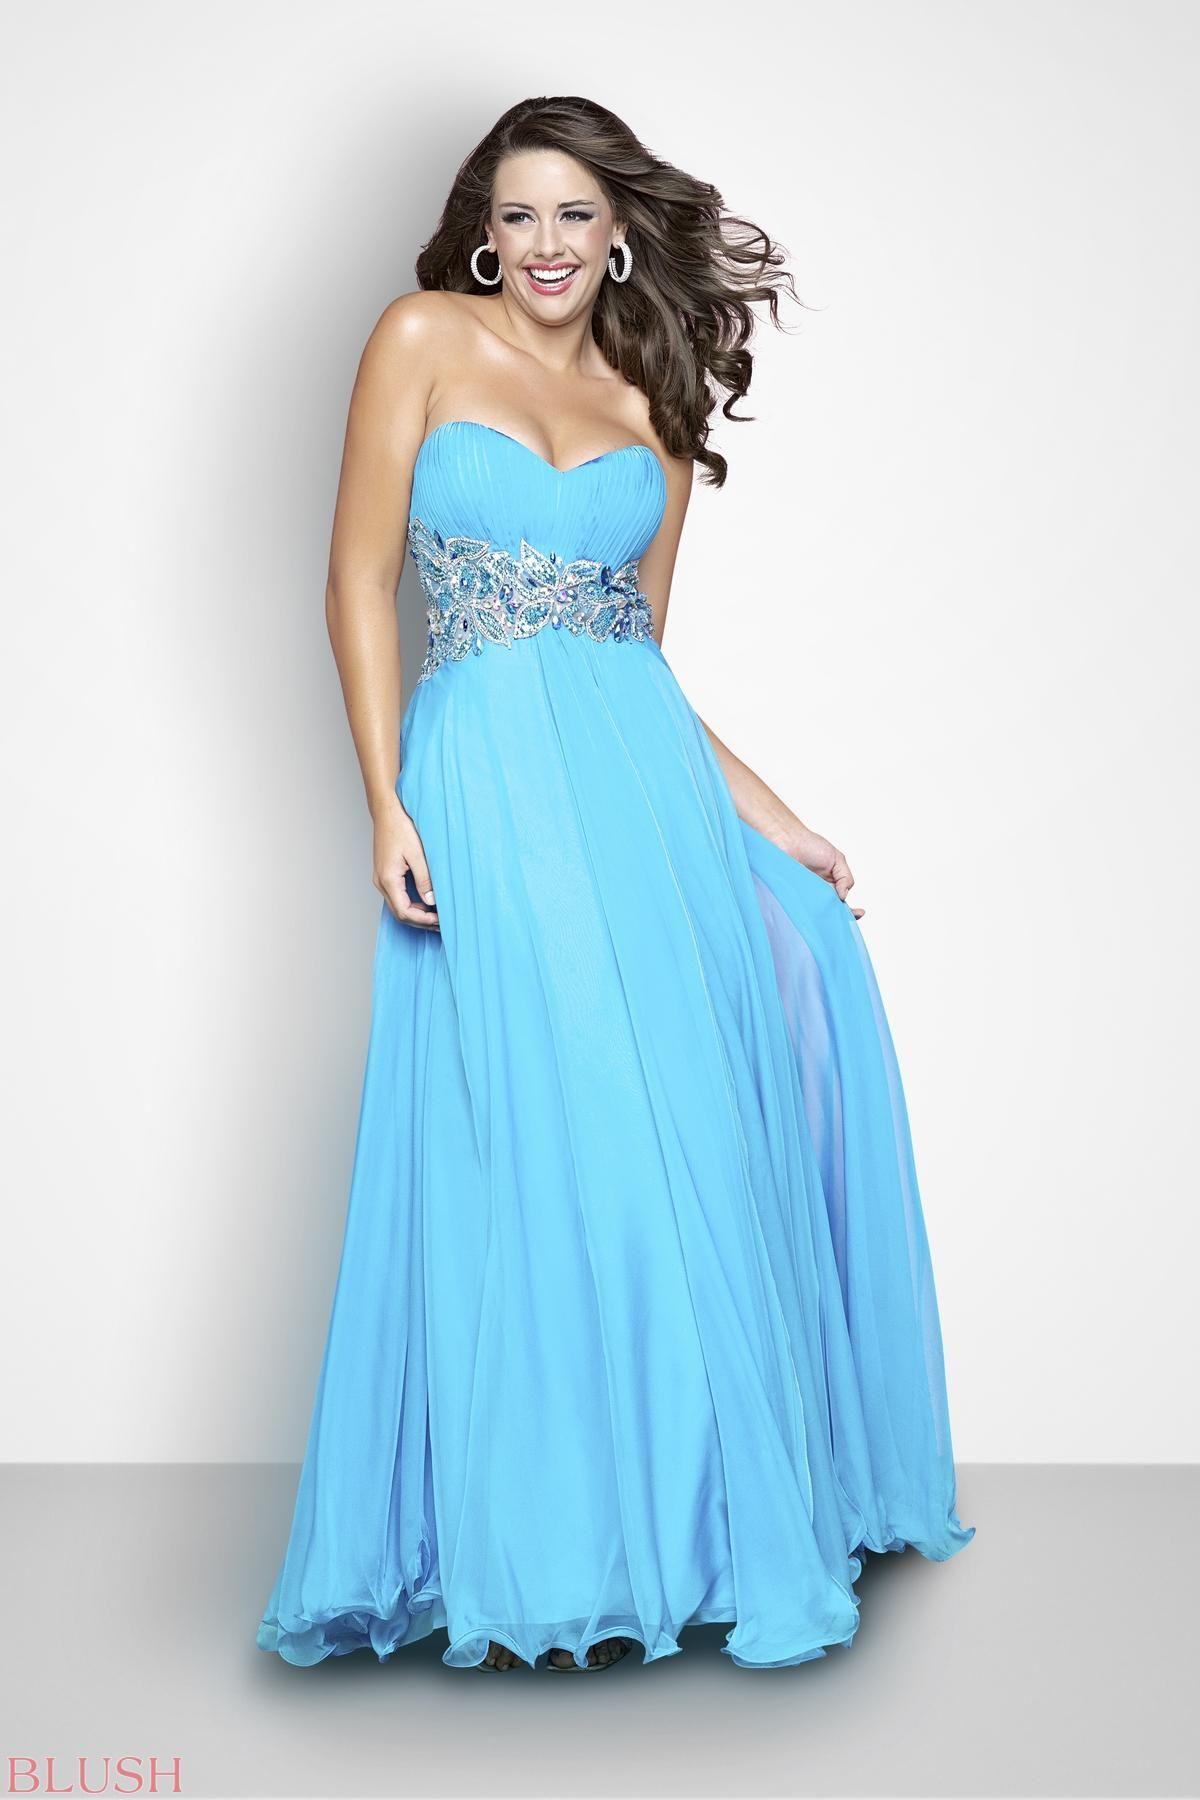 Yo quiero potential prom options pinterest